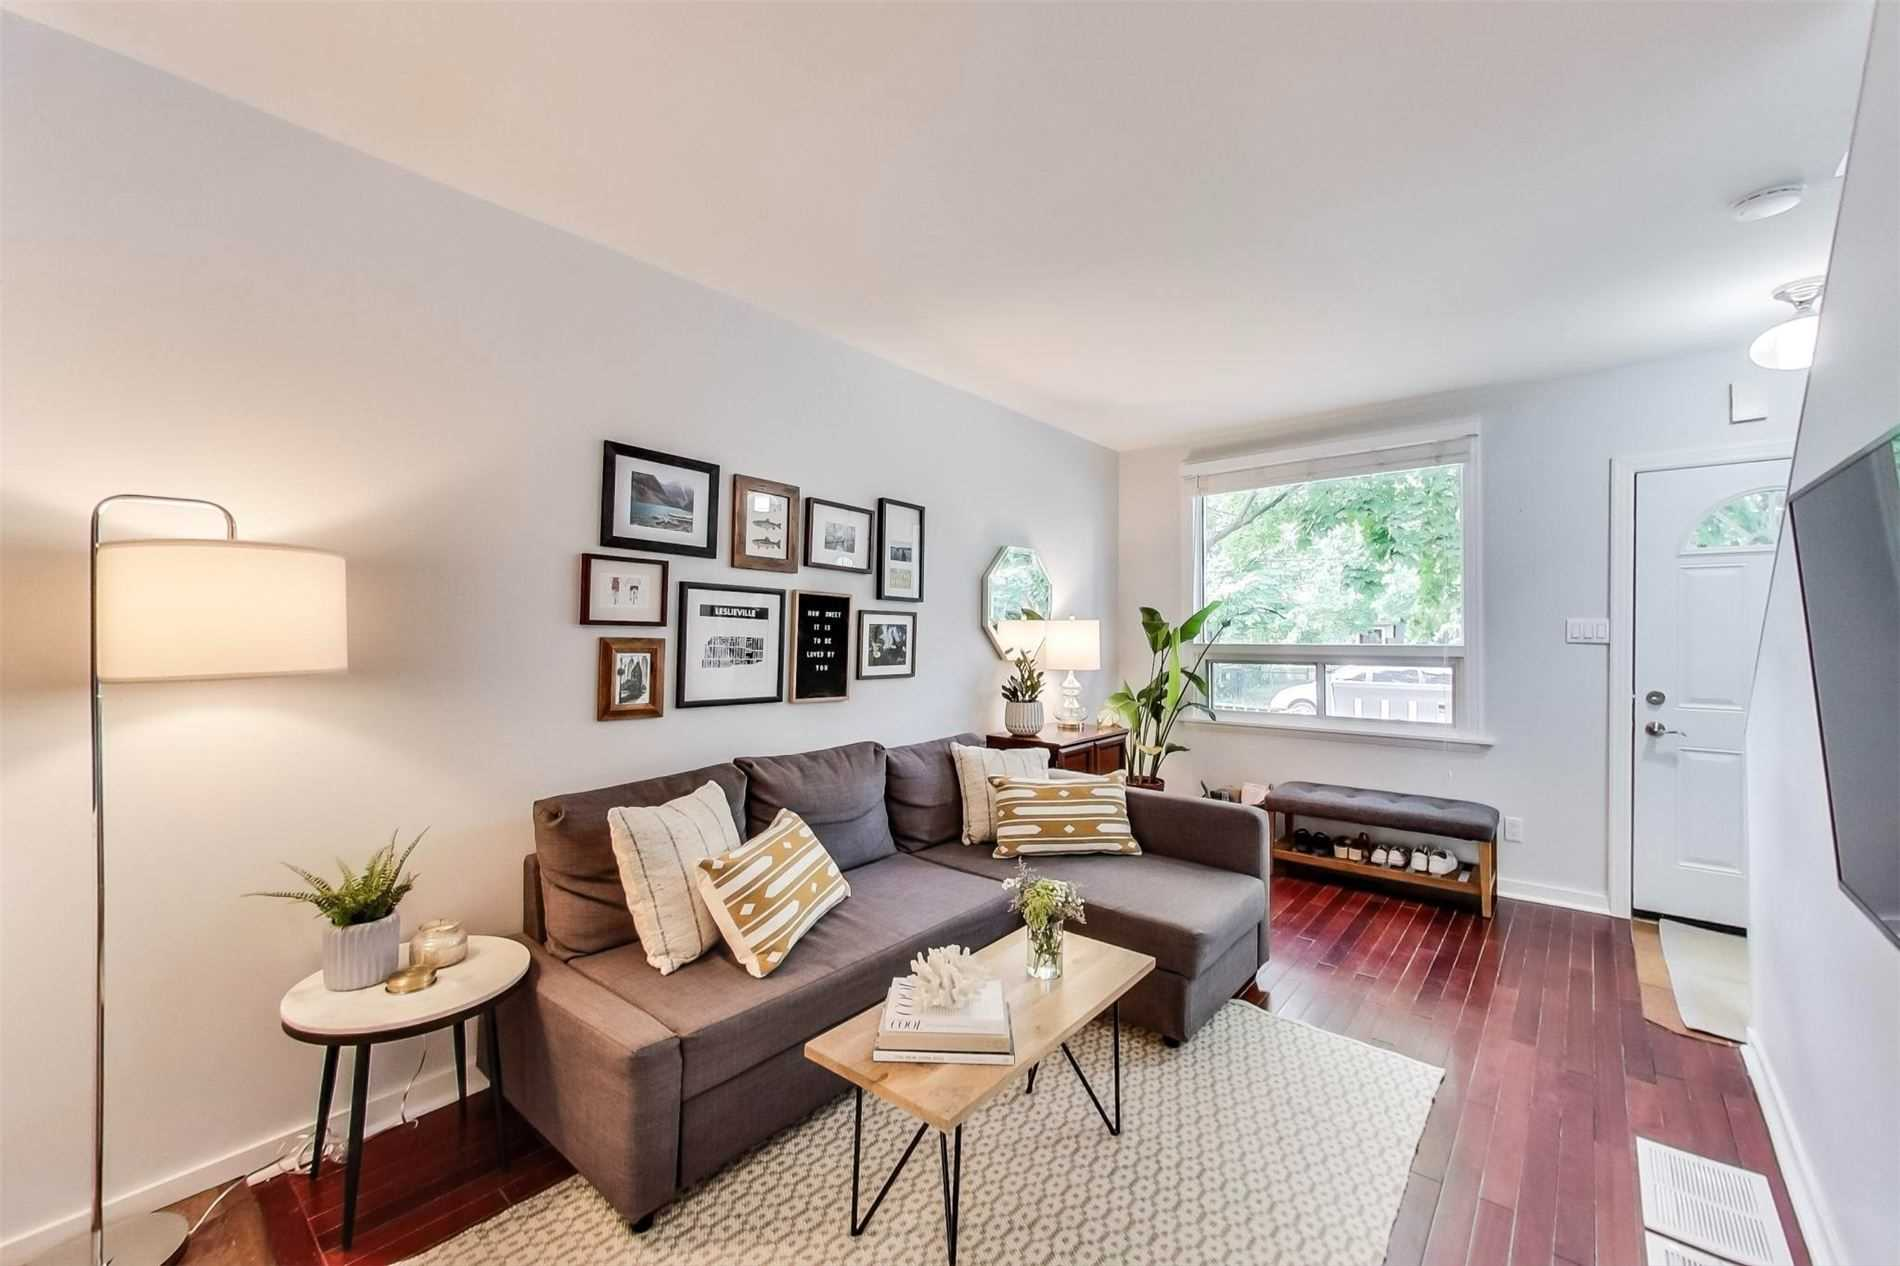 59 1/2 Logan Ave, Toronto, Ontario M4M 2M9, 2 Bedrooms Bedrooms, 5 Rooms Rooms,2 BathroomsBathrooms,Semi-detached,For Sale,Logan,E4912003